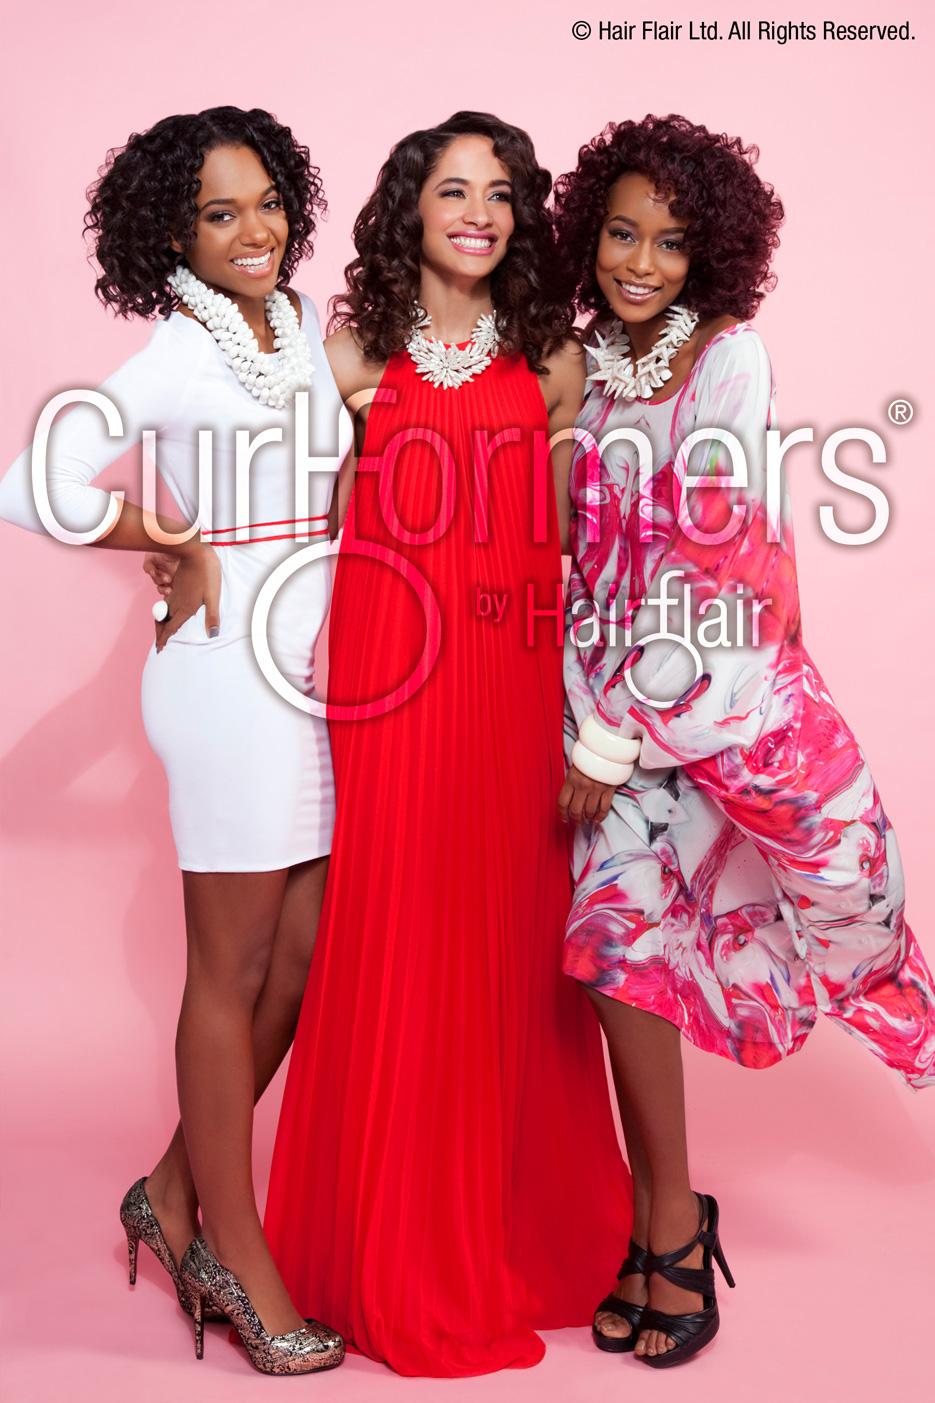 Black hair Magazine Curlformers Cover April May 2013 Fashion stylist Erica Matthews